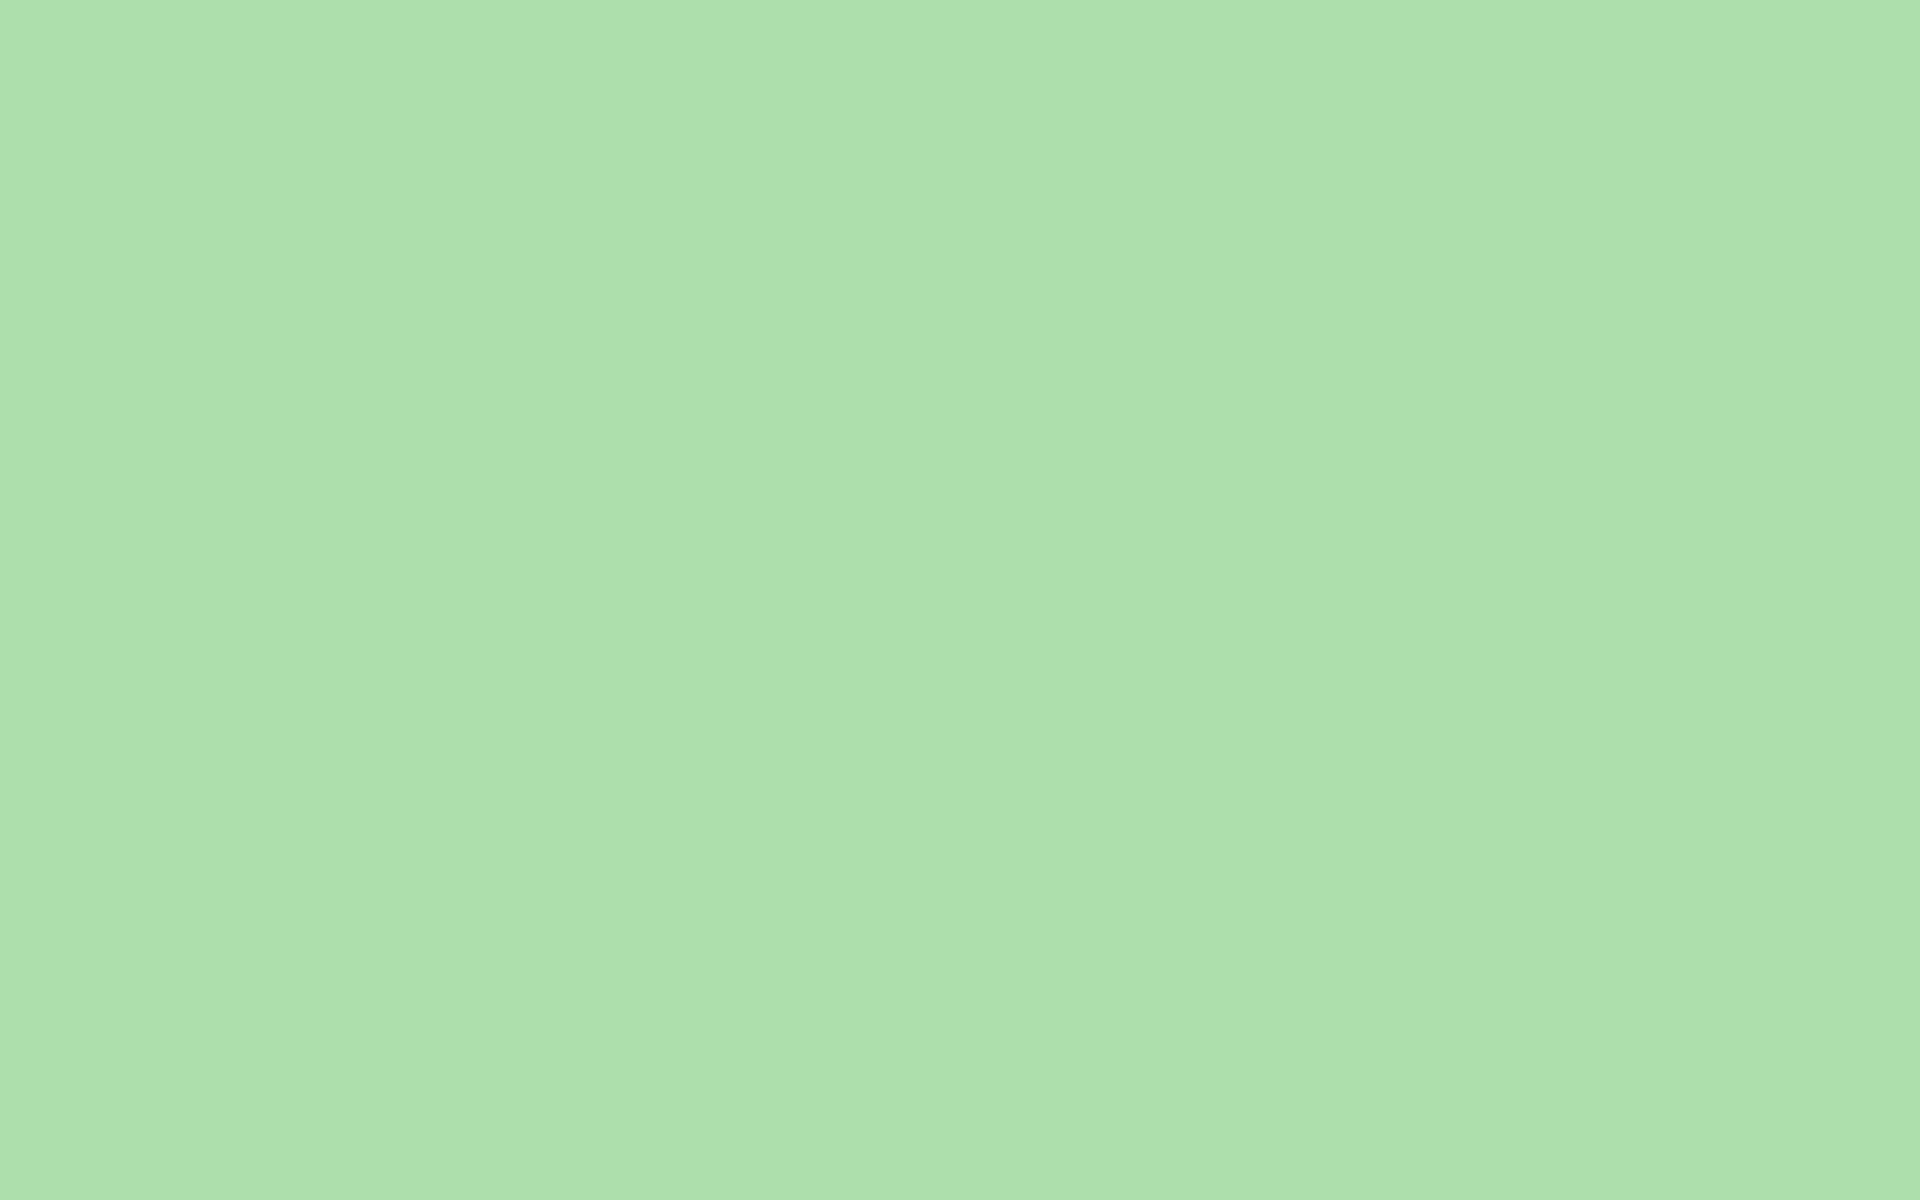 Light Green Solid Color Wallpaper 49783